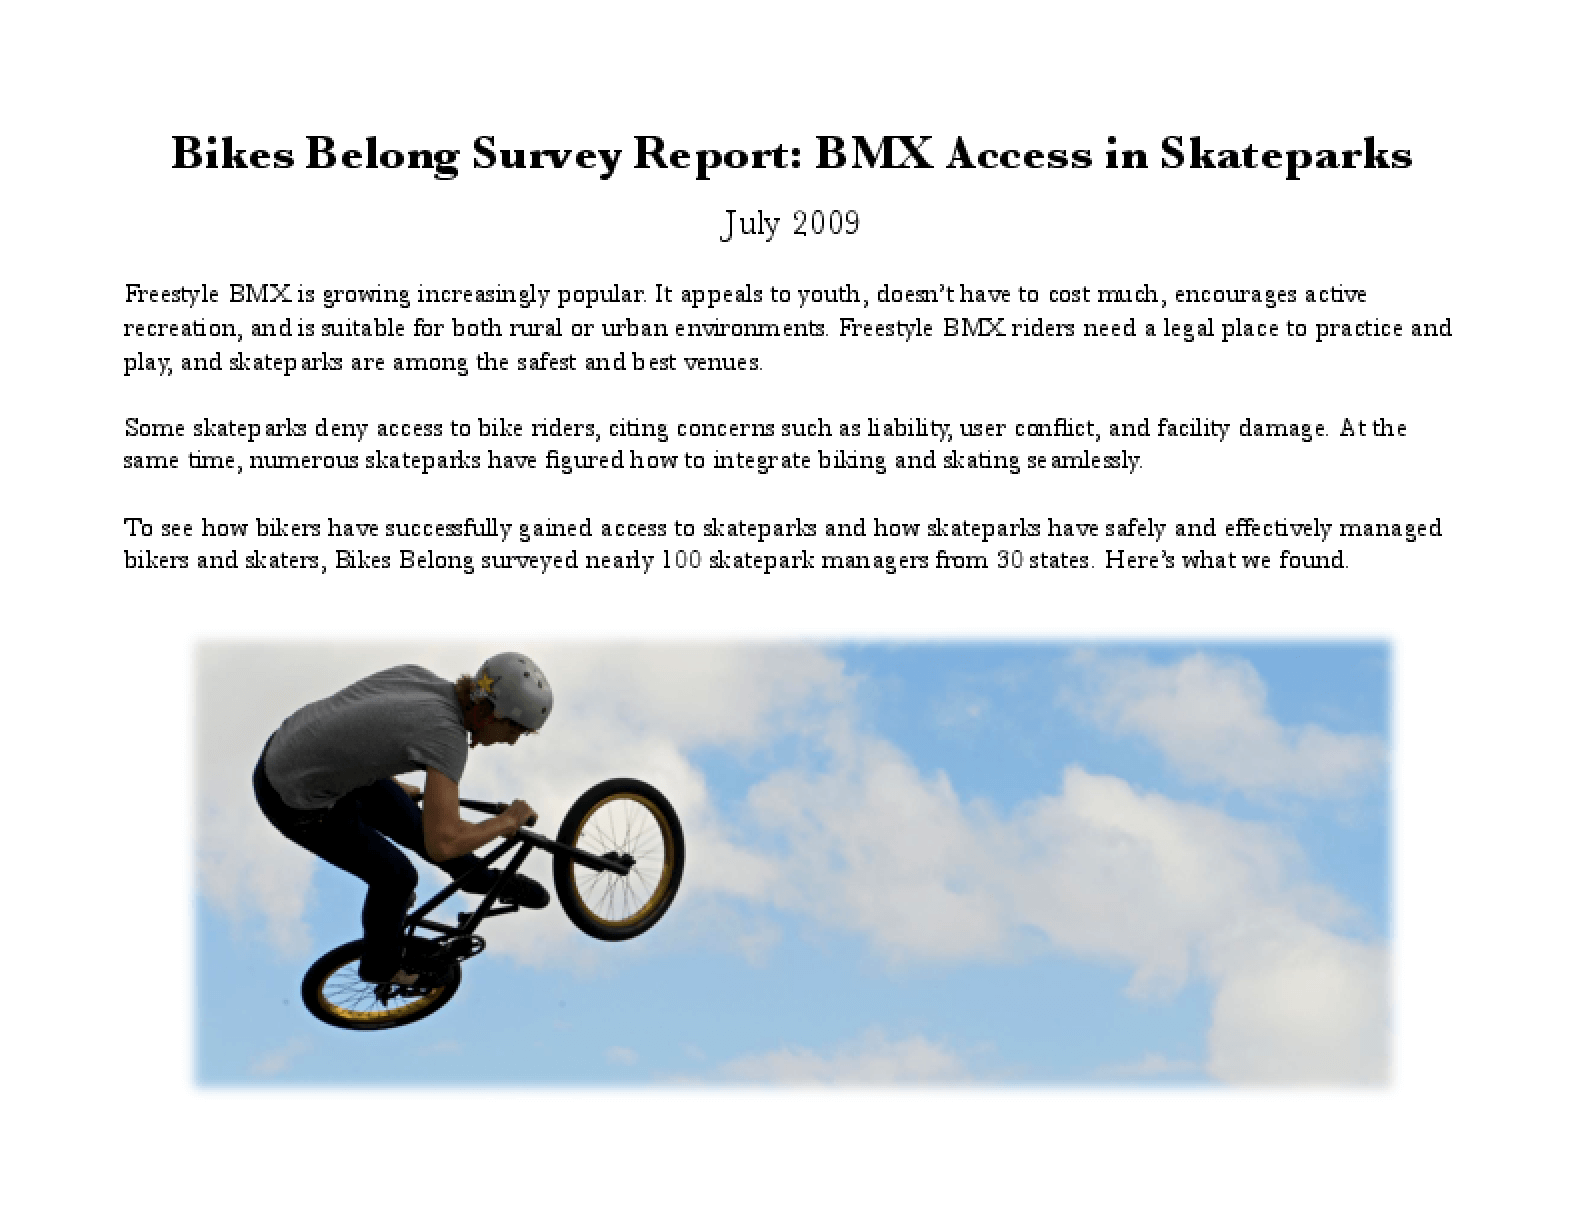 BMX Access in Skateparks Survey